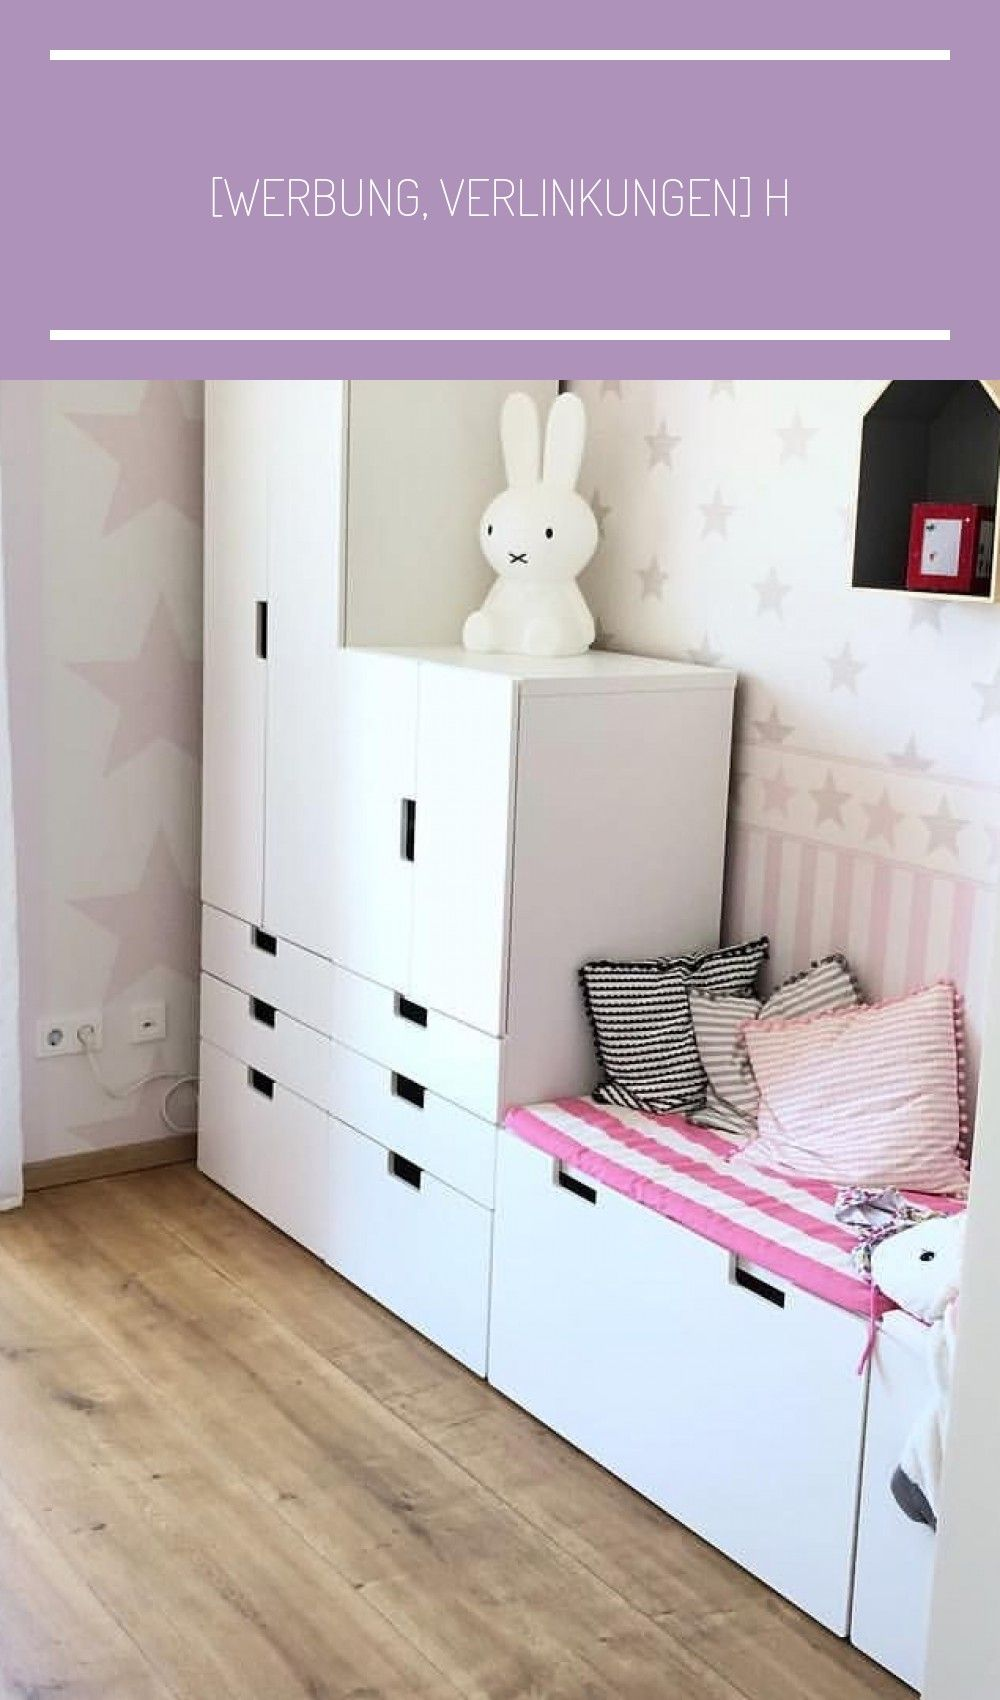 Ikea Dorm Room Ideas: [Werbung, Verlinkungen] H In 2020